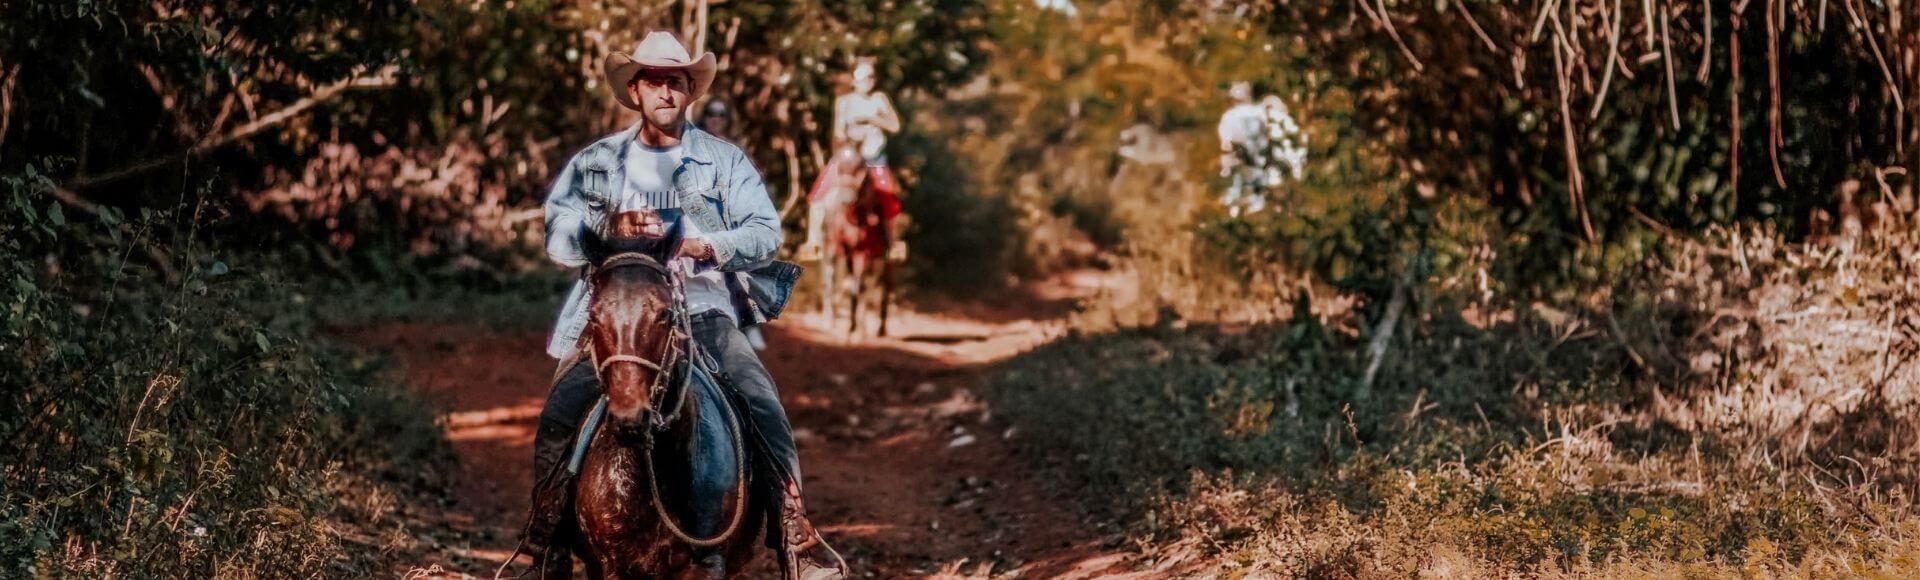 photo of man riding a horse